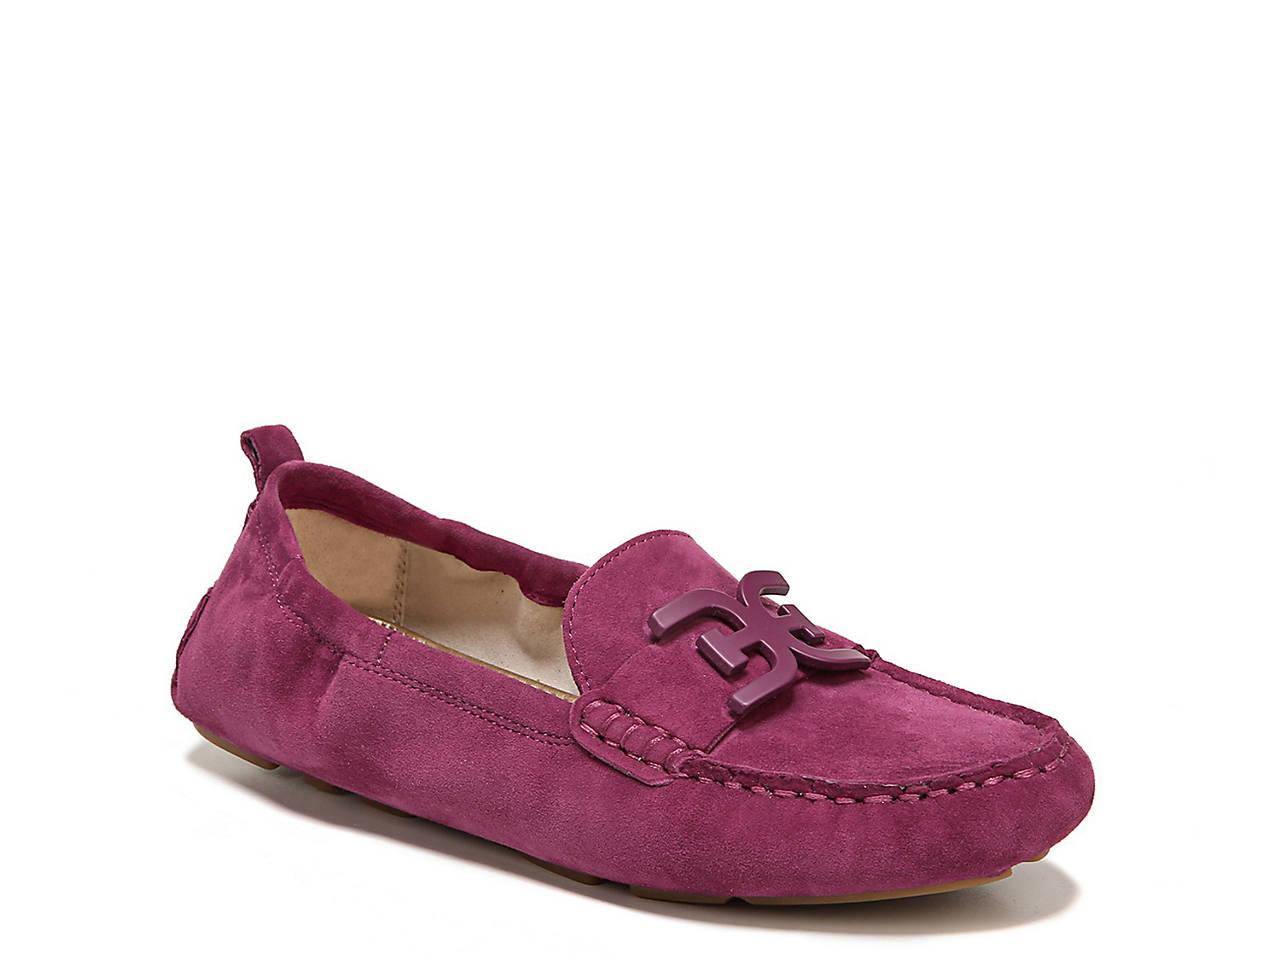 24f46f1225f Sam Edelman Farrell Loafer Women s Shoes